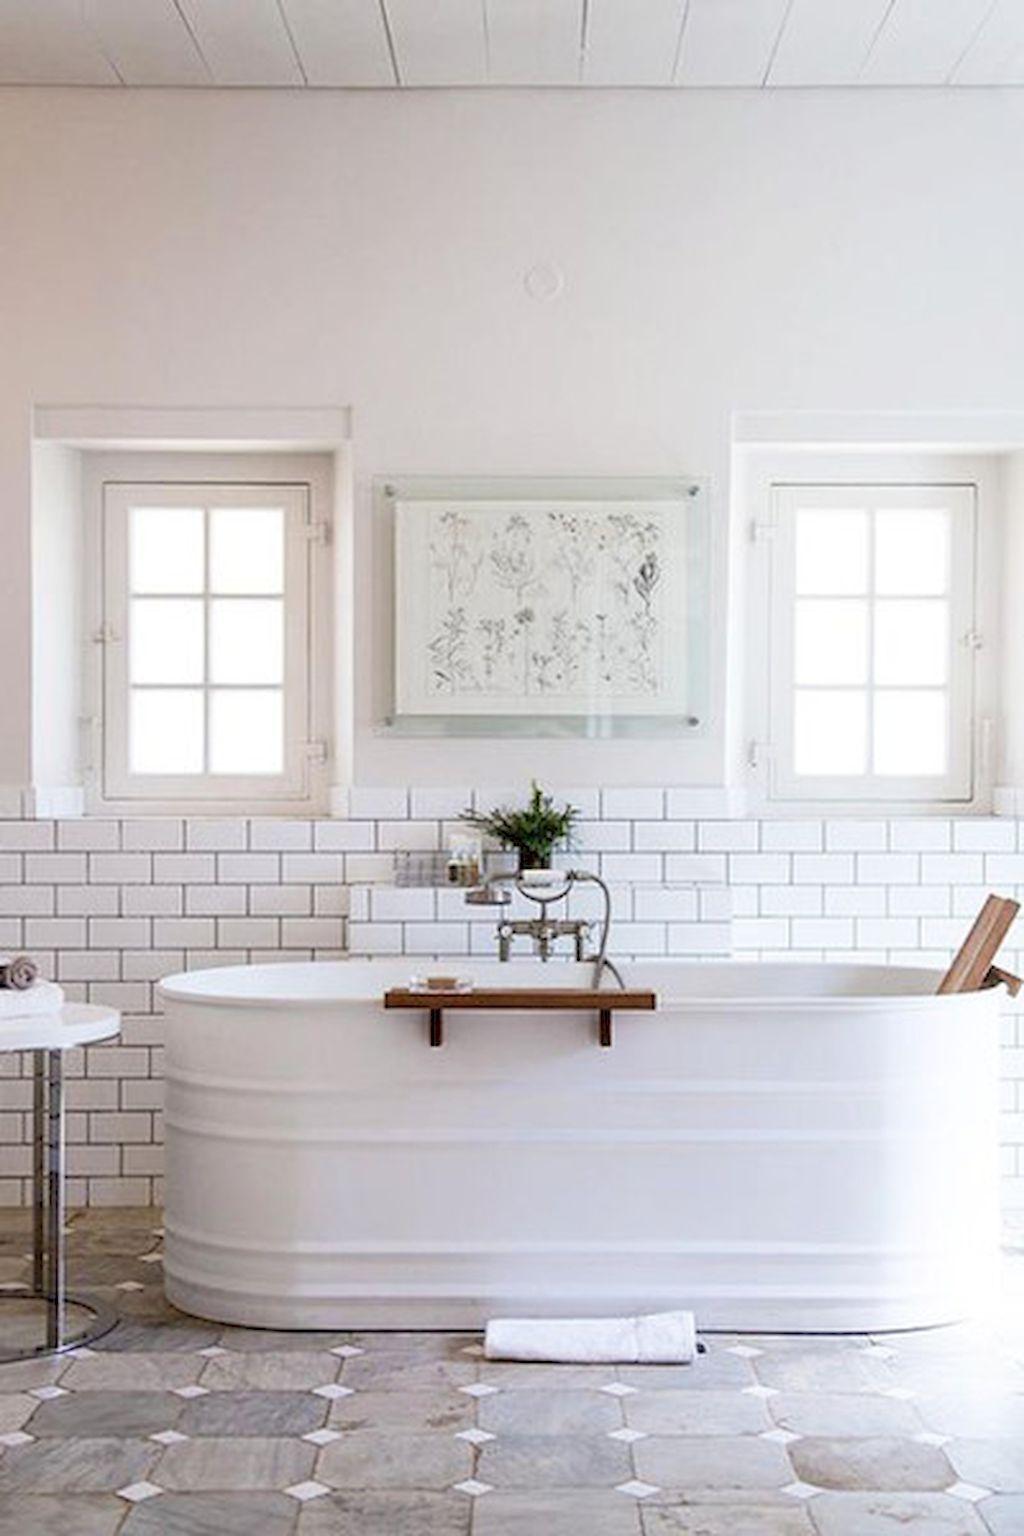 Vintage farmhouse bathroom remodel ideas on a budget (46 ...